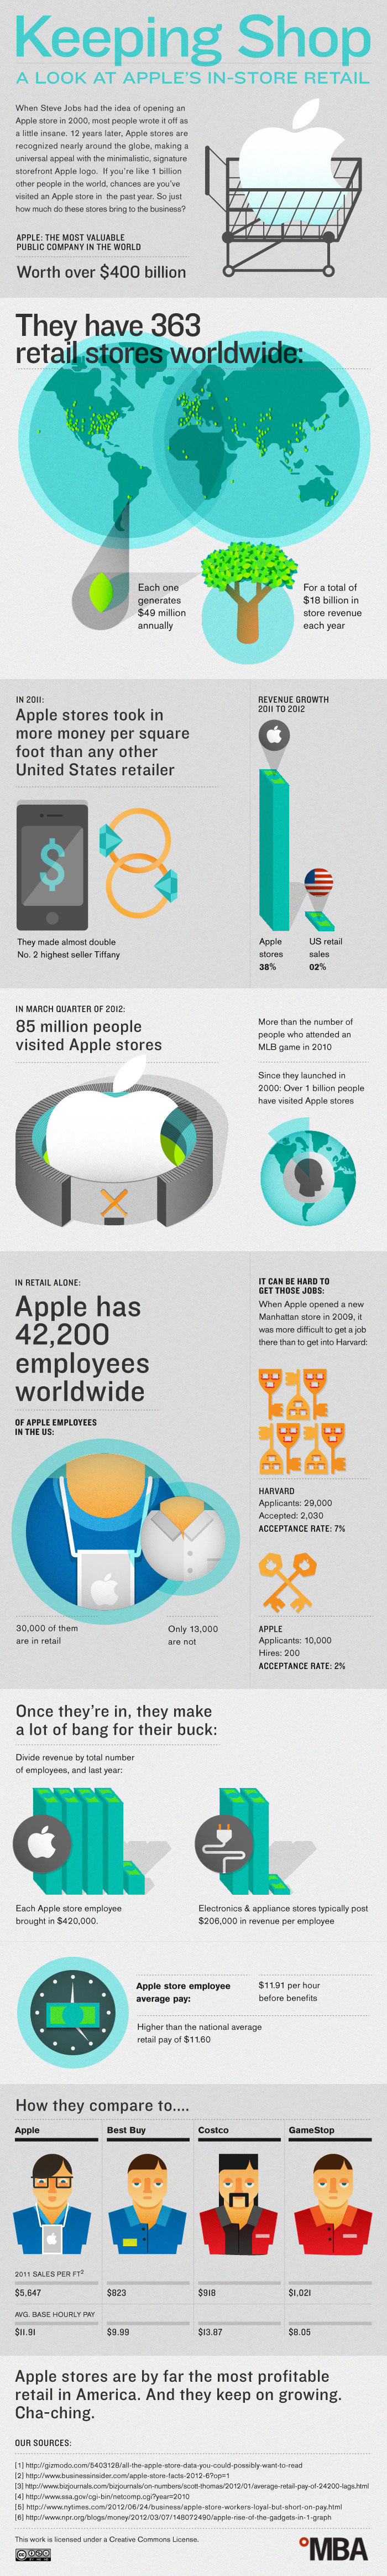 Apple Store Sales Statistics 2012 Infographic